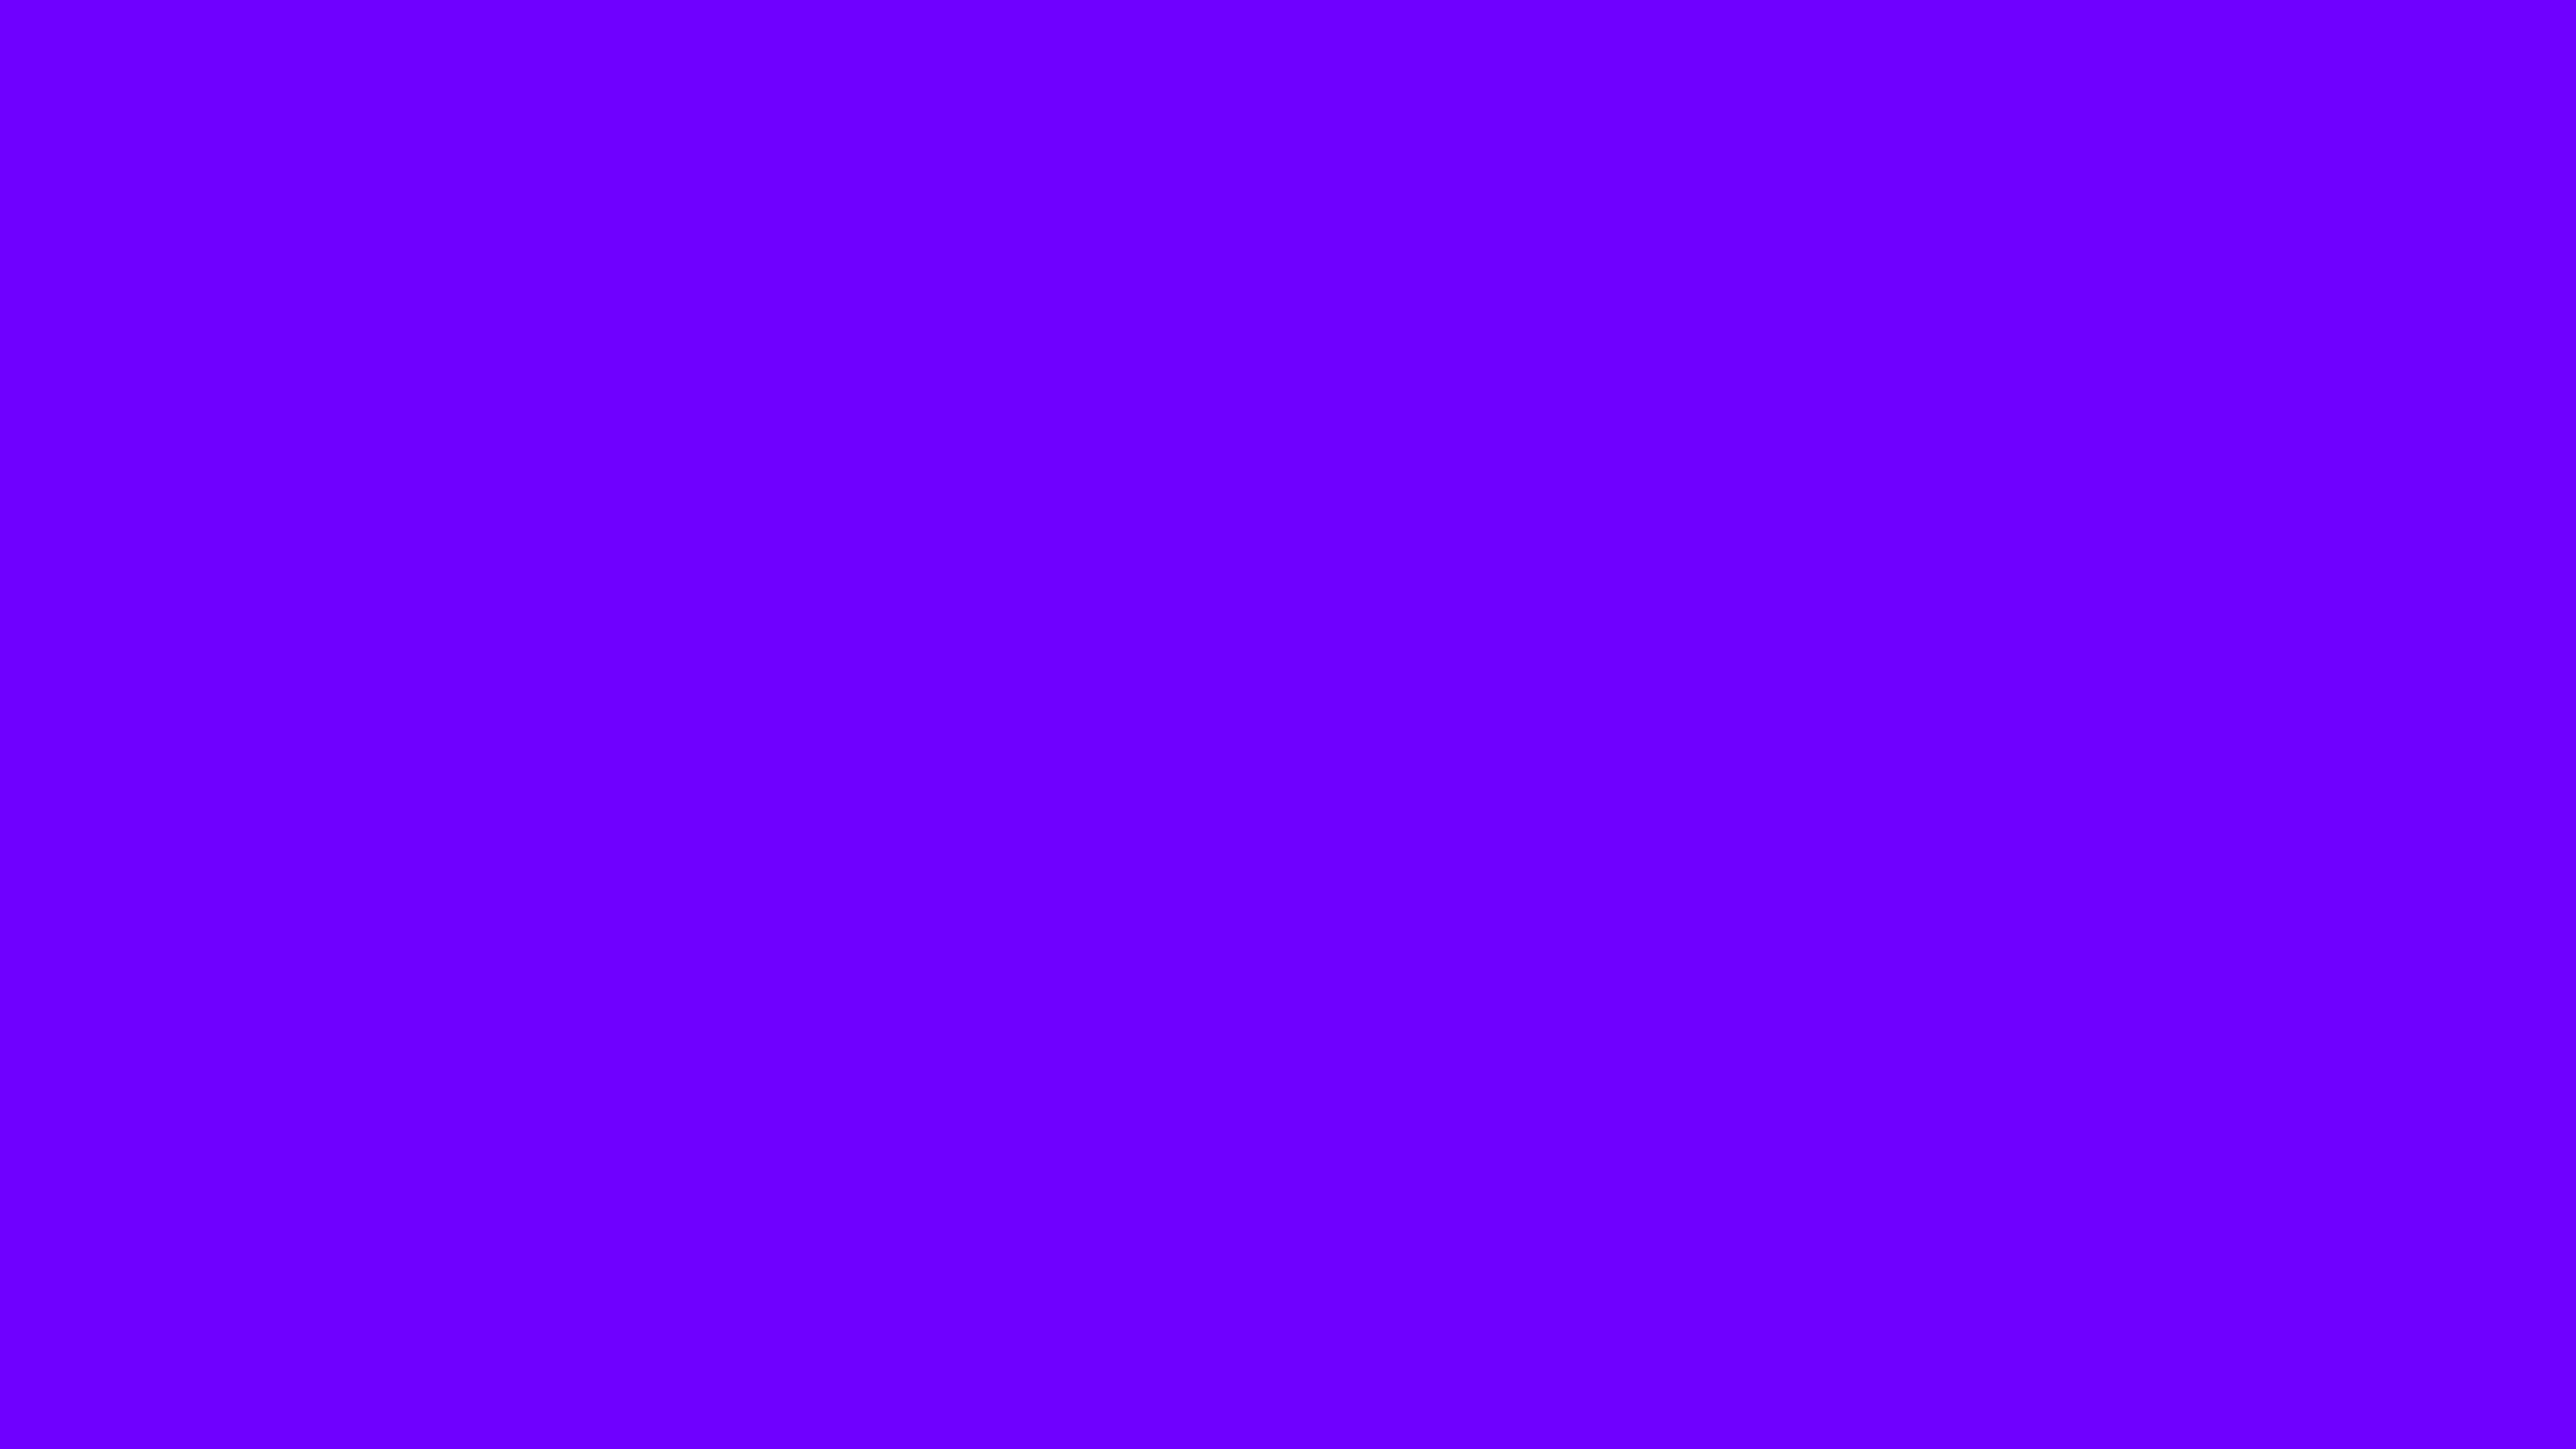 3840x2160 Electric Indigo Solid Color Background